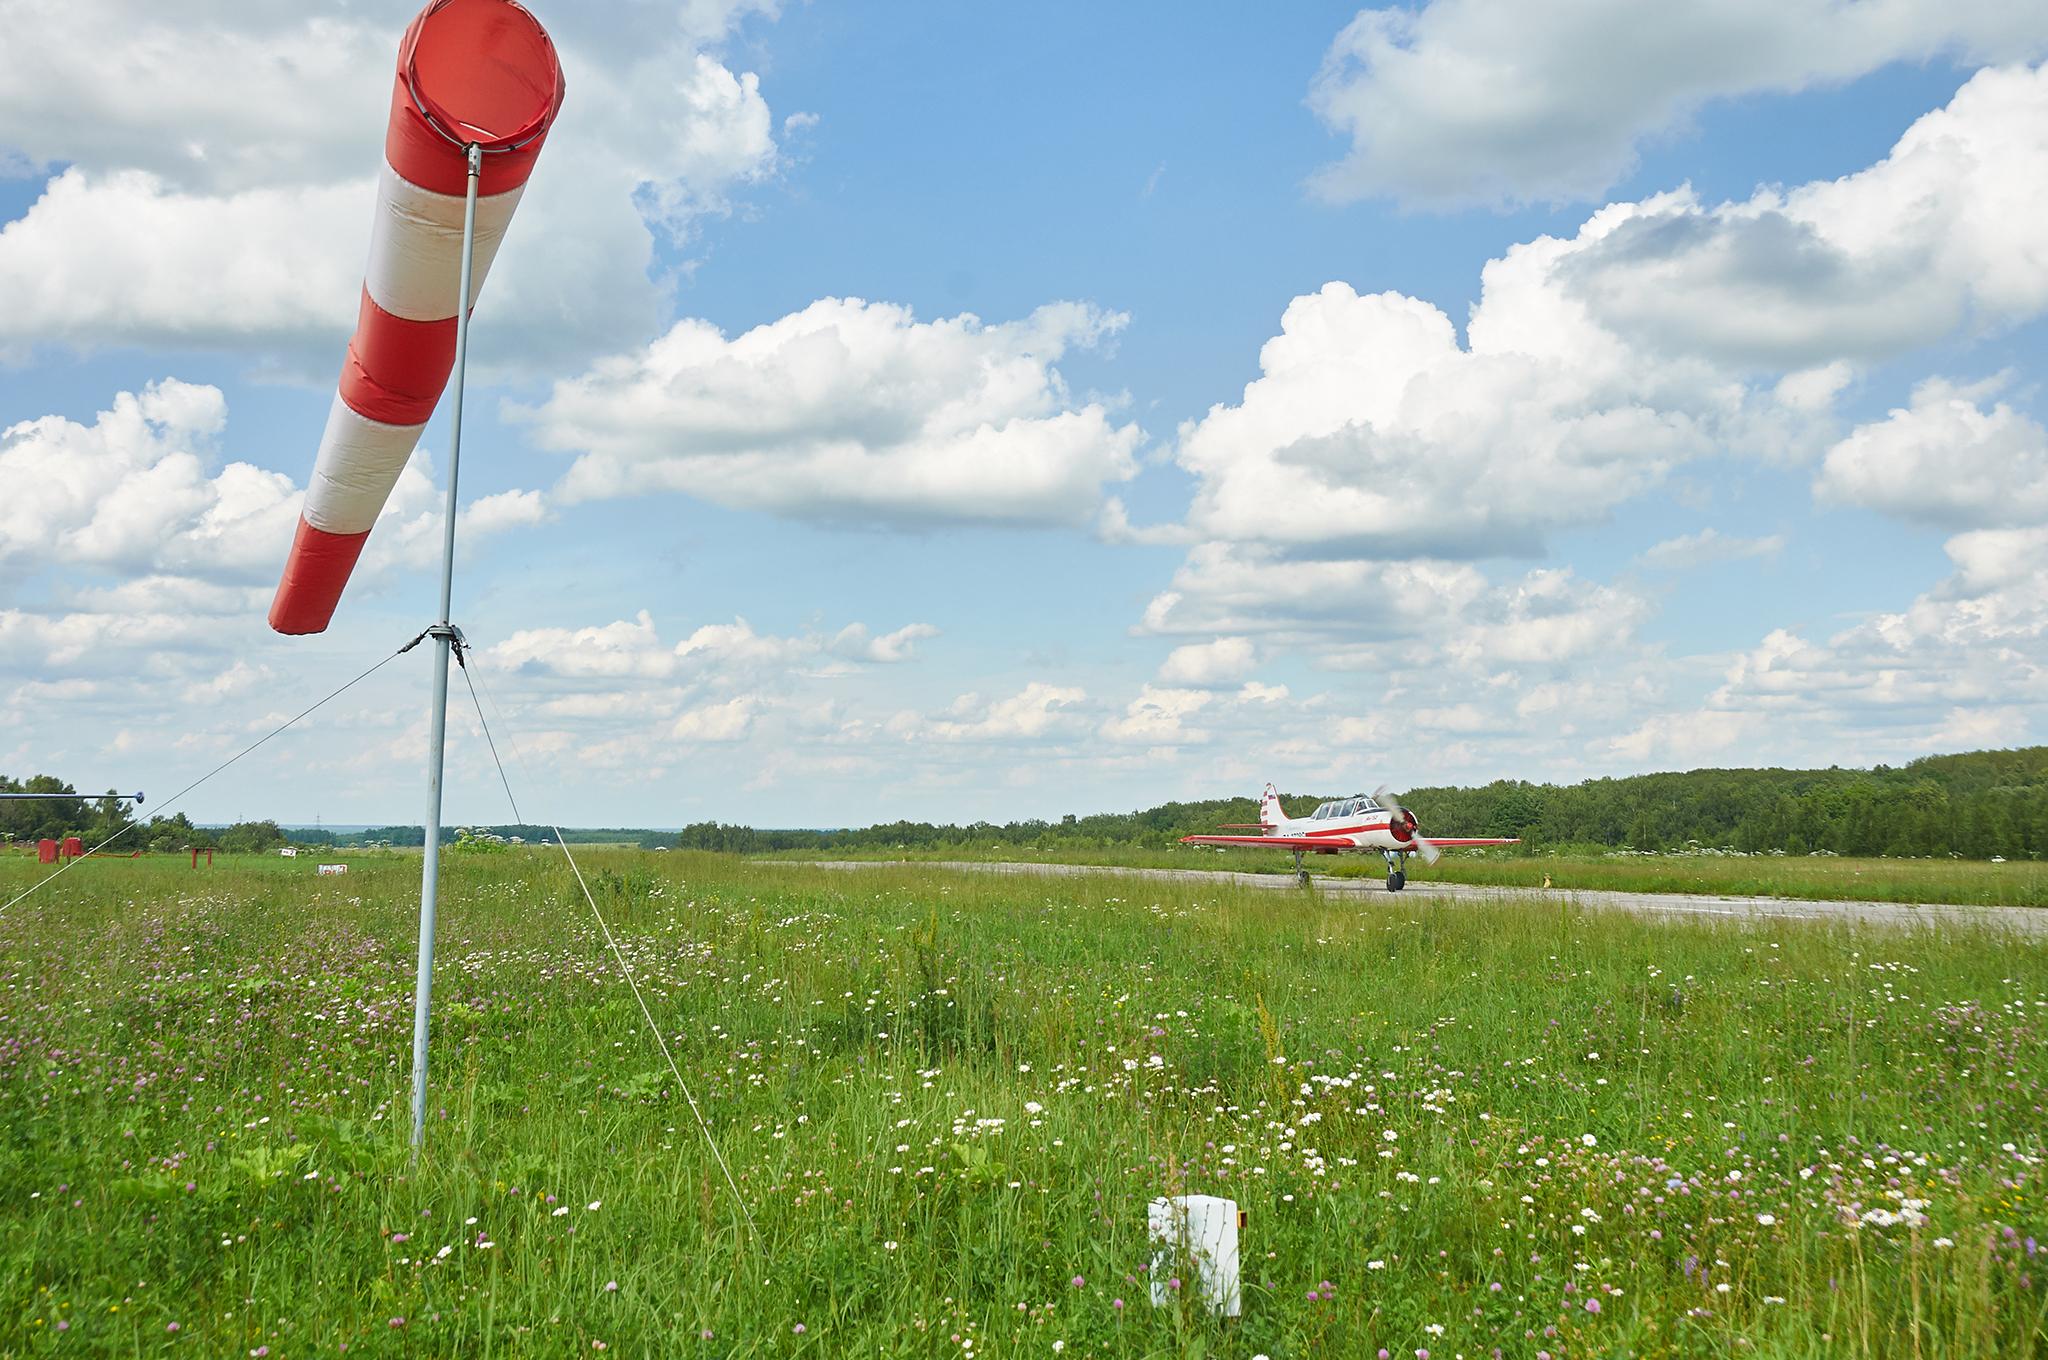 Flowers, runway and Andrey in the Yak-52 ~ Газон в цветах, взлётная полоса и Андрей в Яке